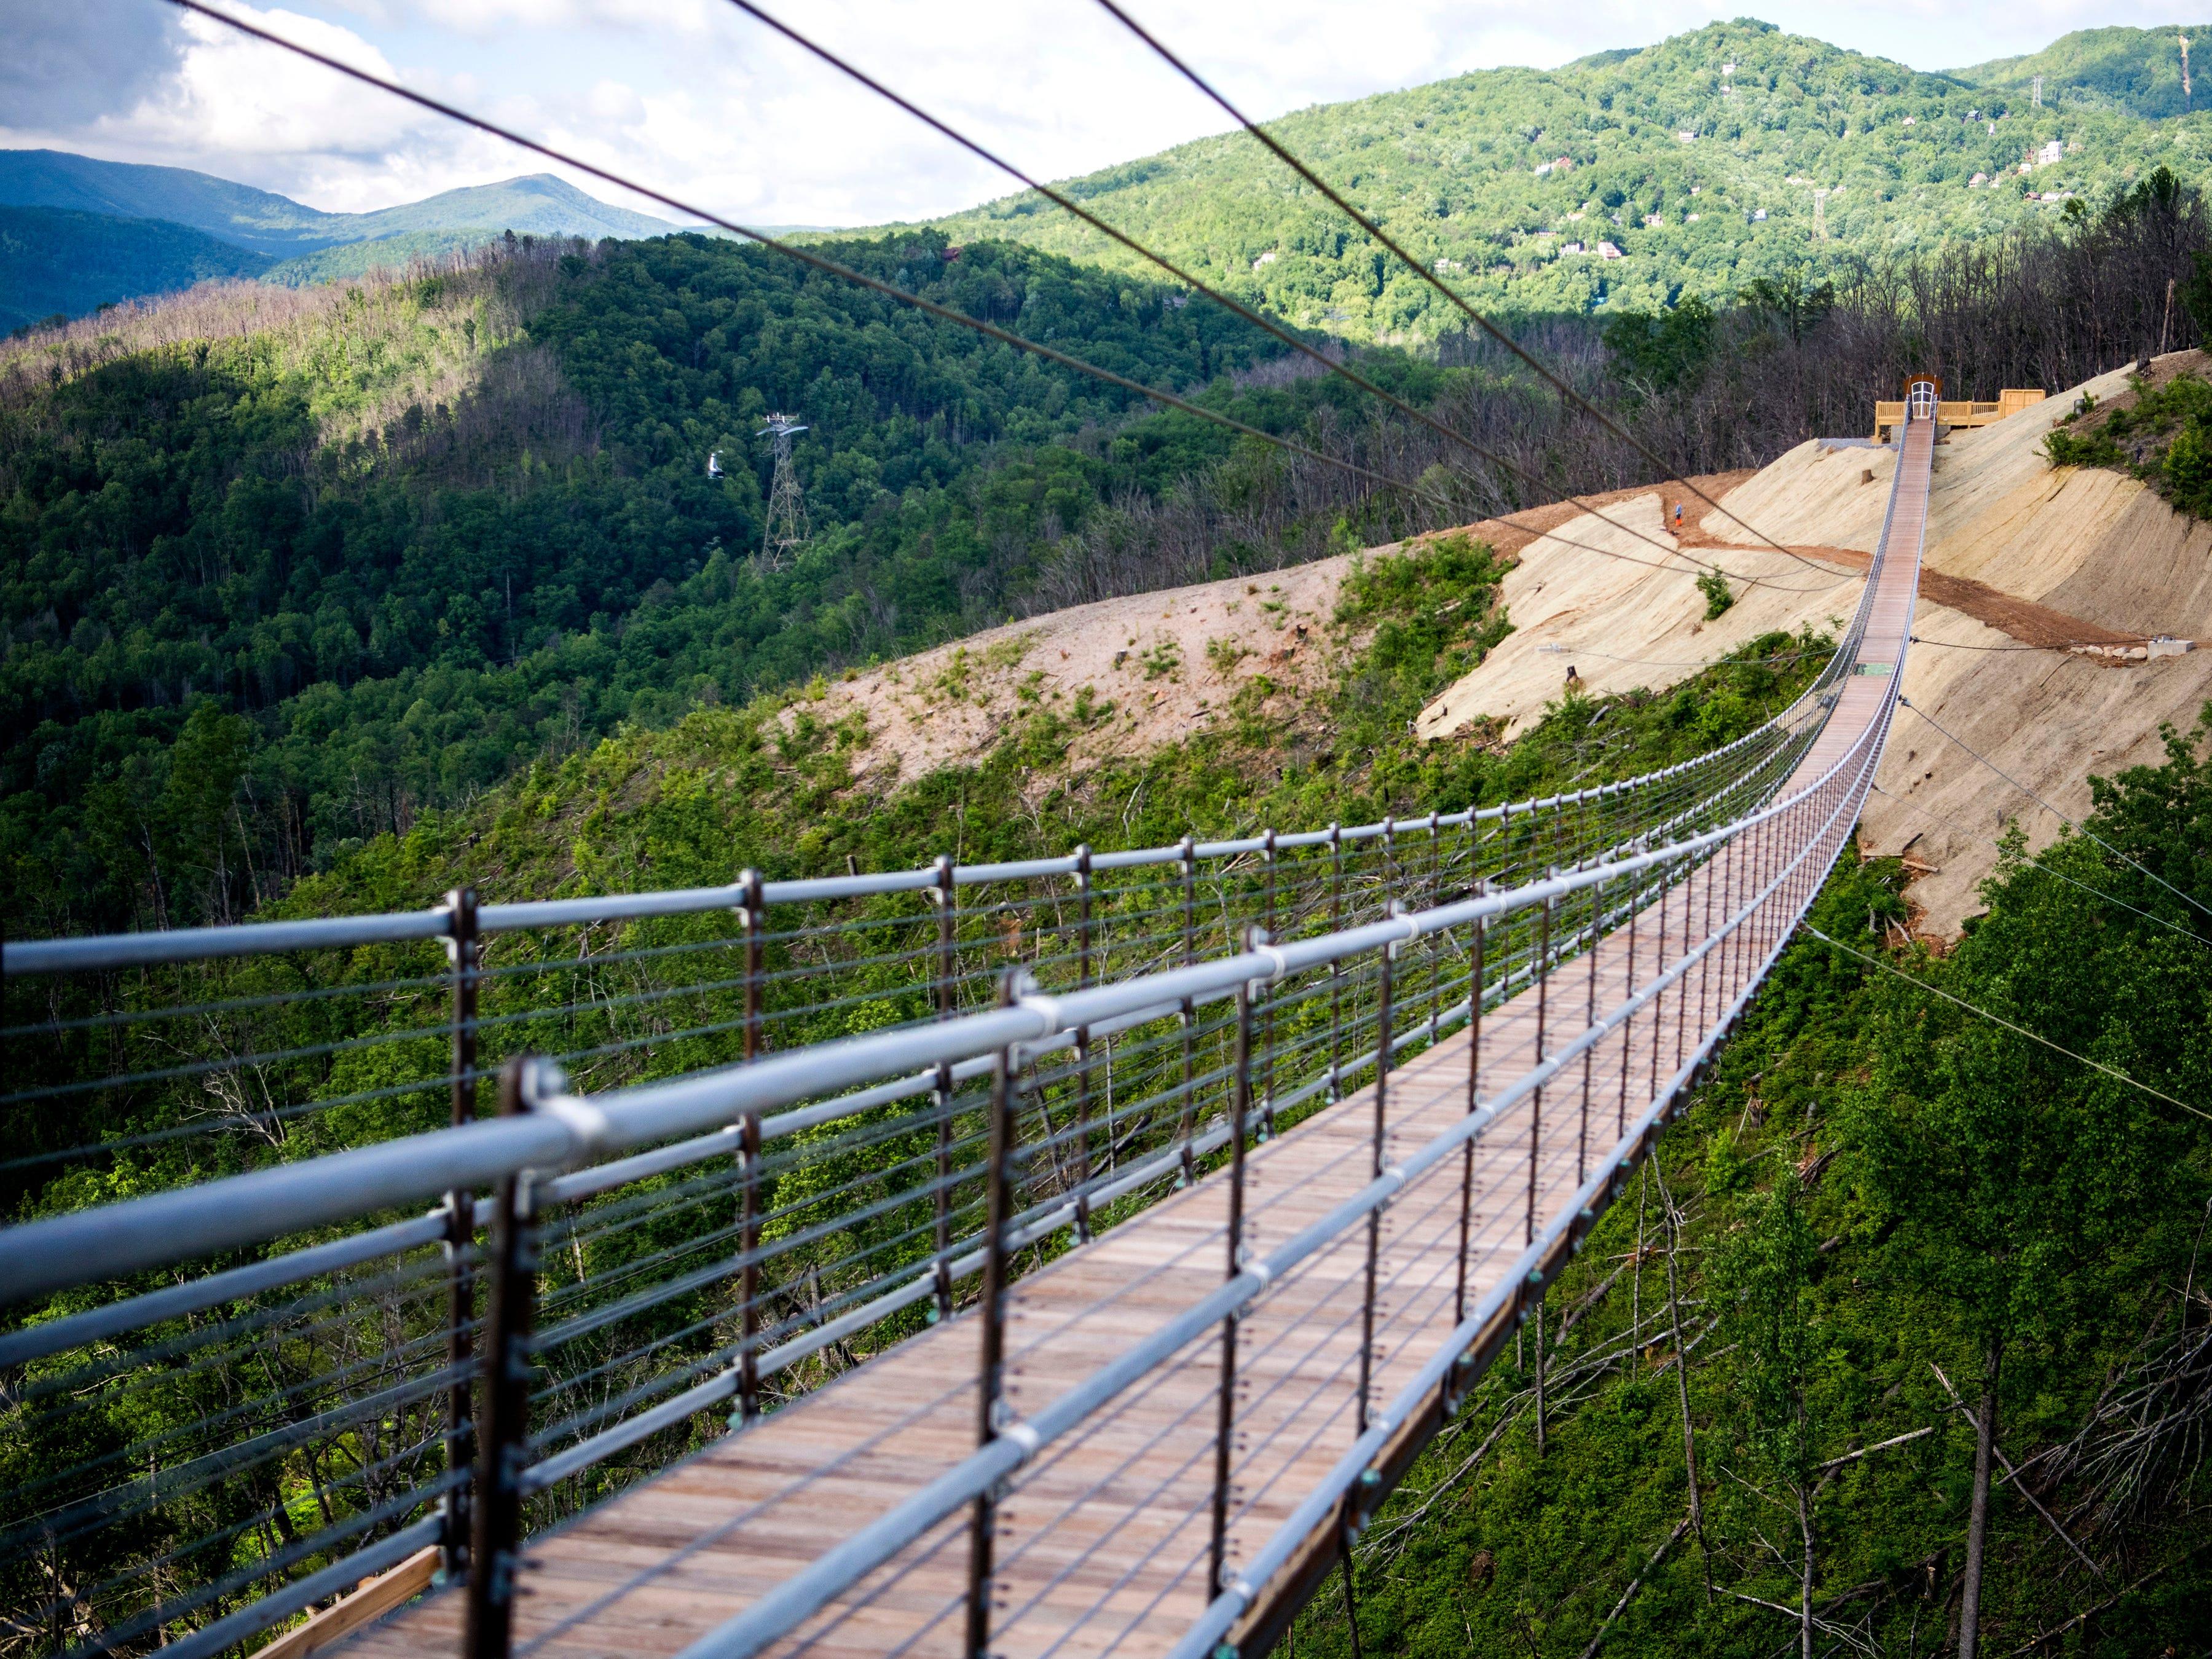 The Gatlinburg SkyBridge is North America's longest pedestrian suspension bridge and offers panoramic views of Gatlinburg and the Smoky Mountains.